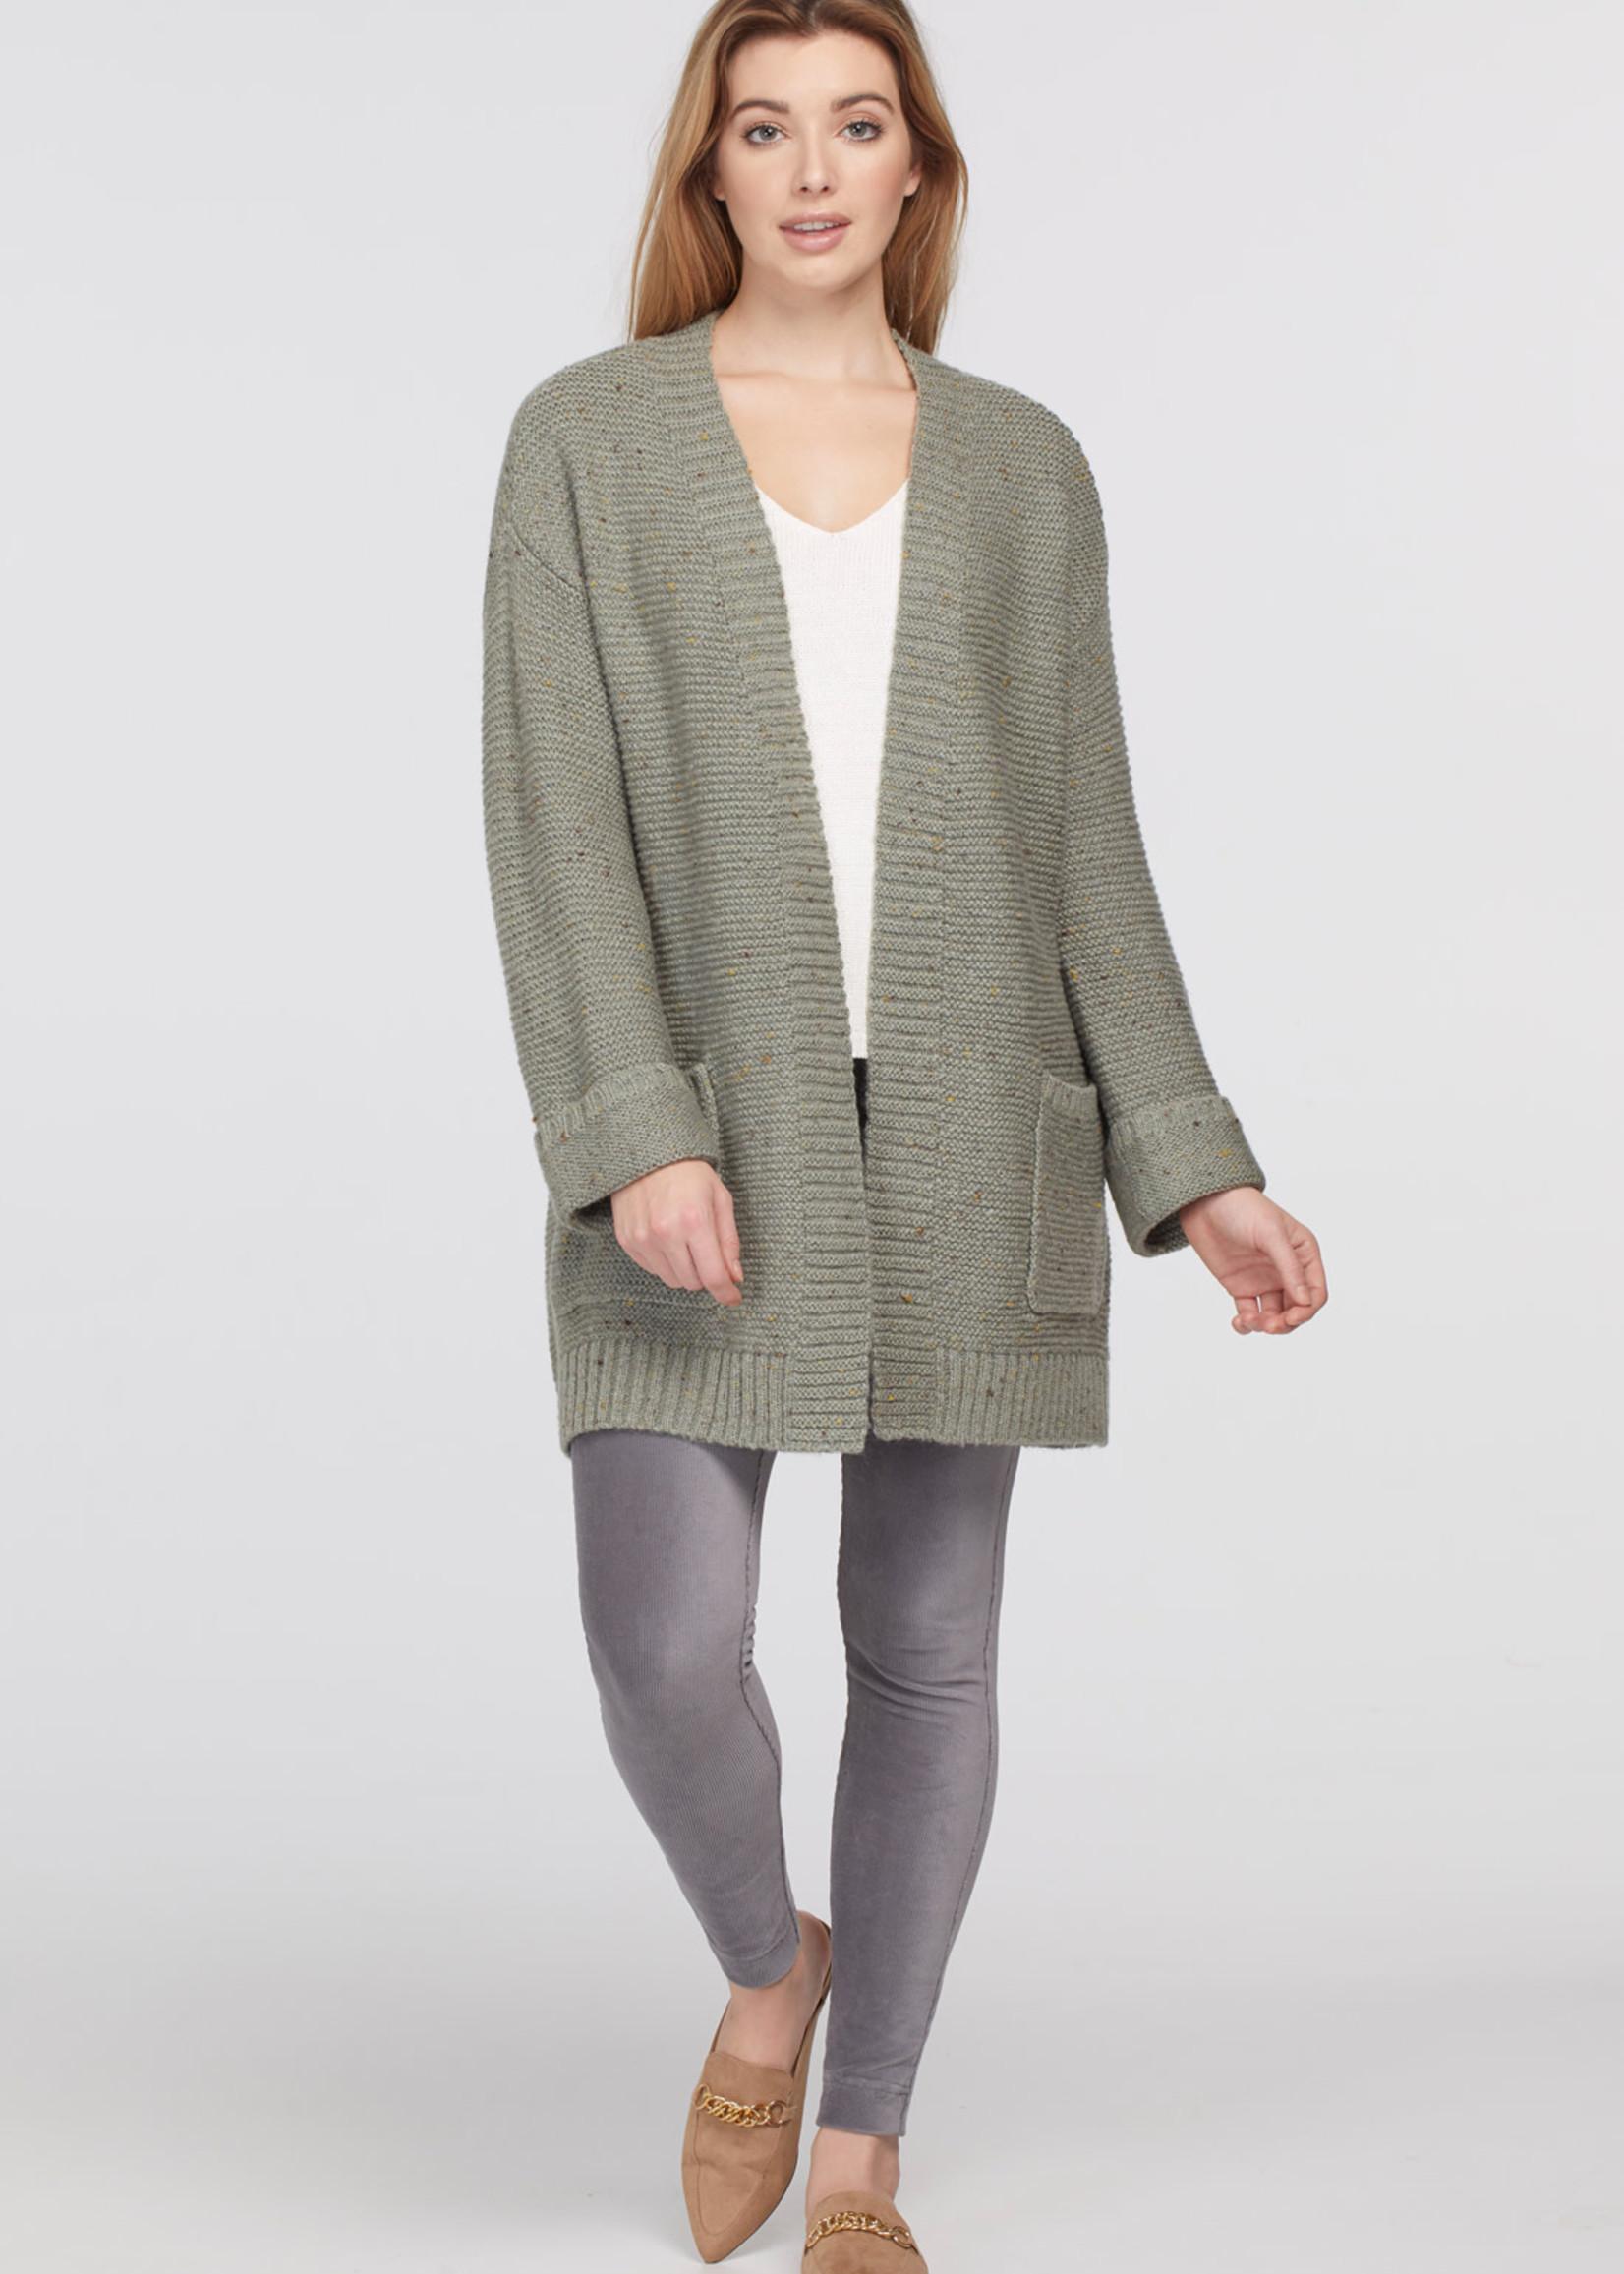 Tribal Oversized Sweater Cardigan 71310